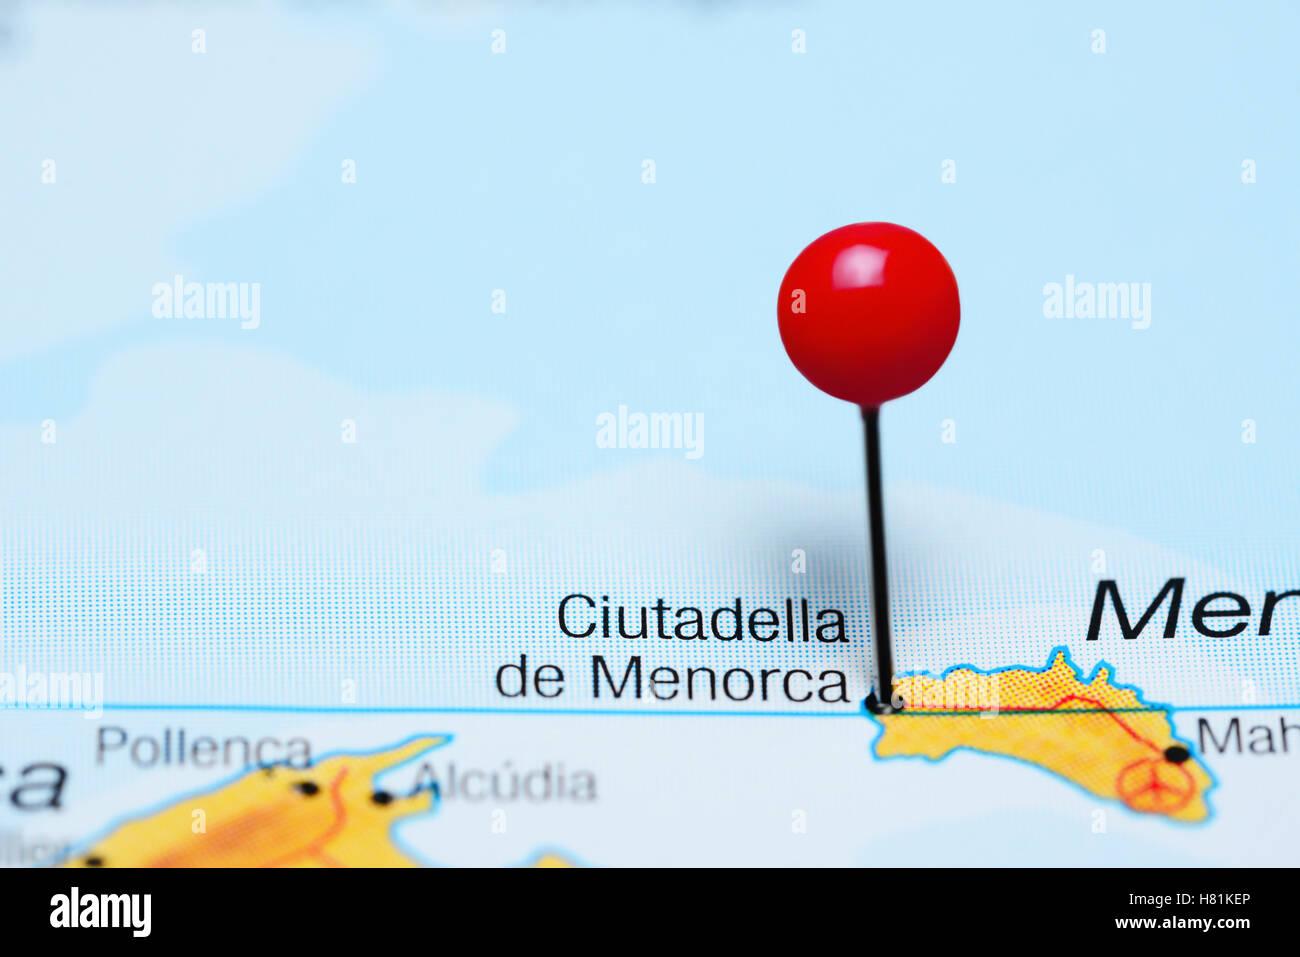 Ciutadella De Menorca Pinned On A Map Of Spain Stock Photo